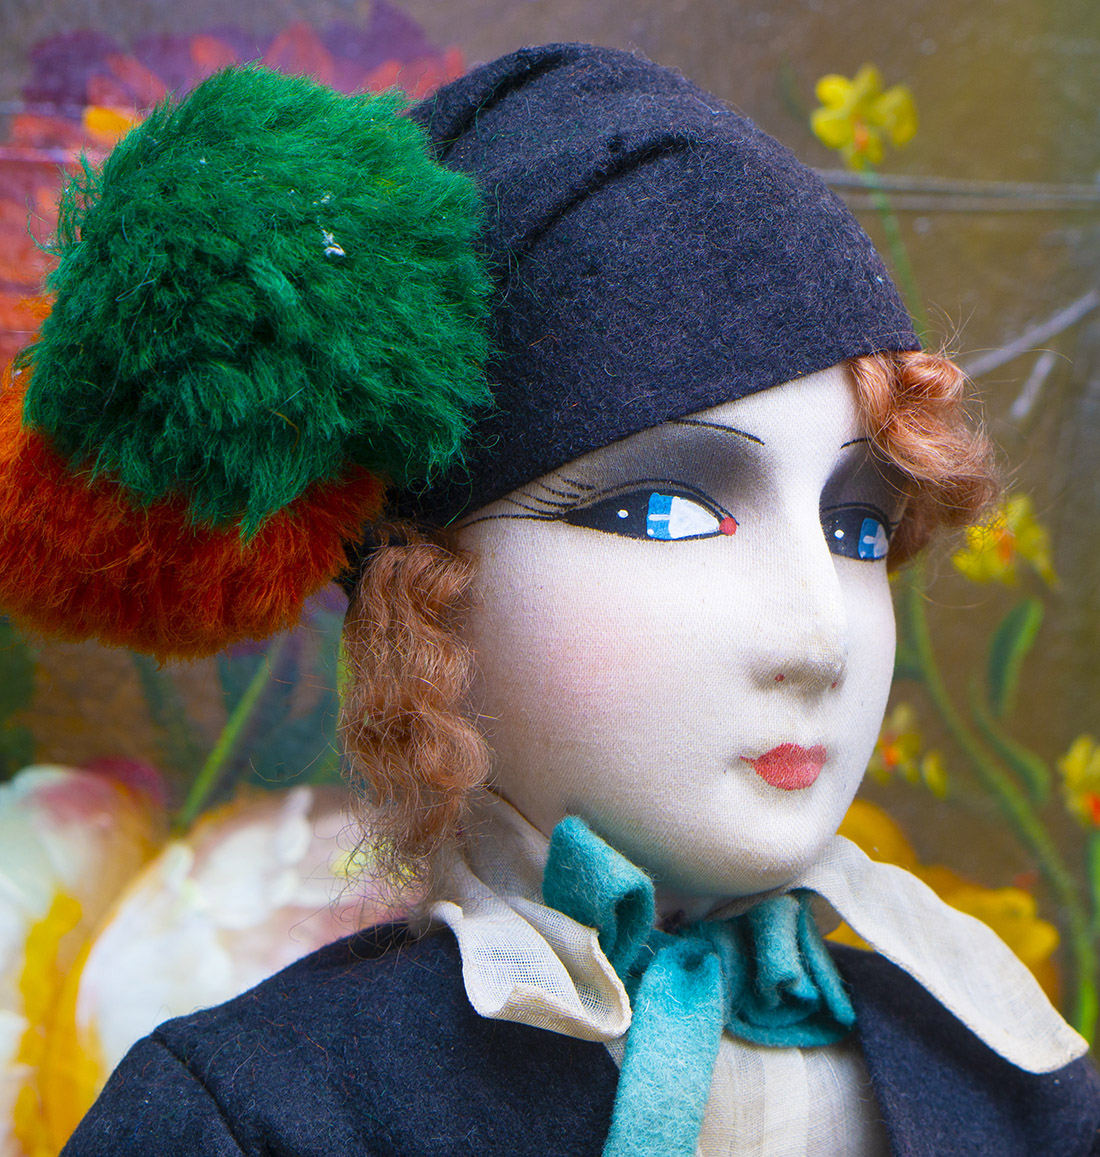 Antique Arlequin doll